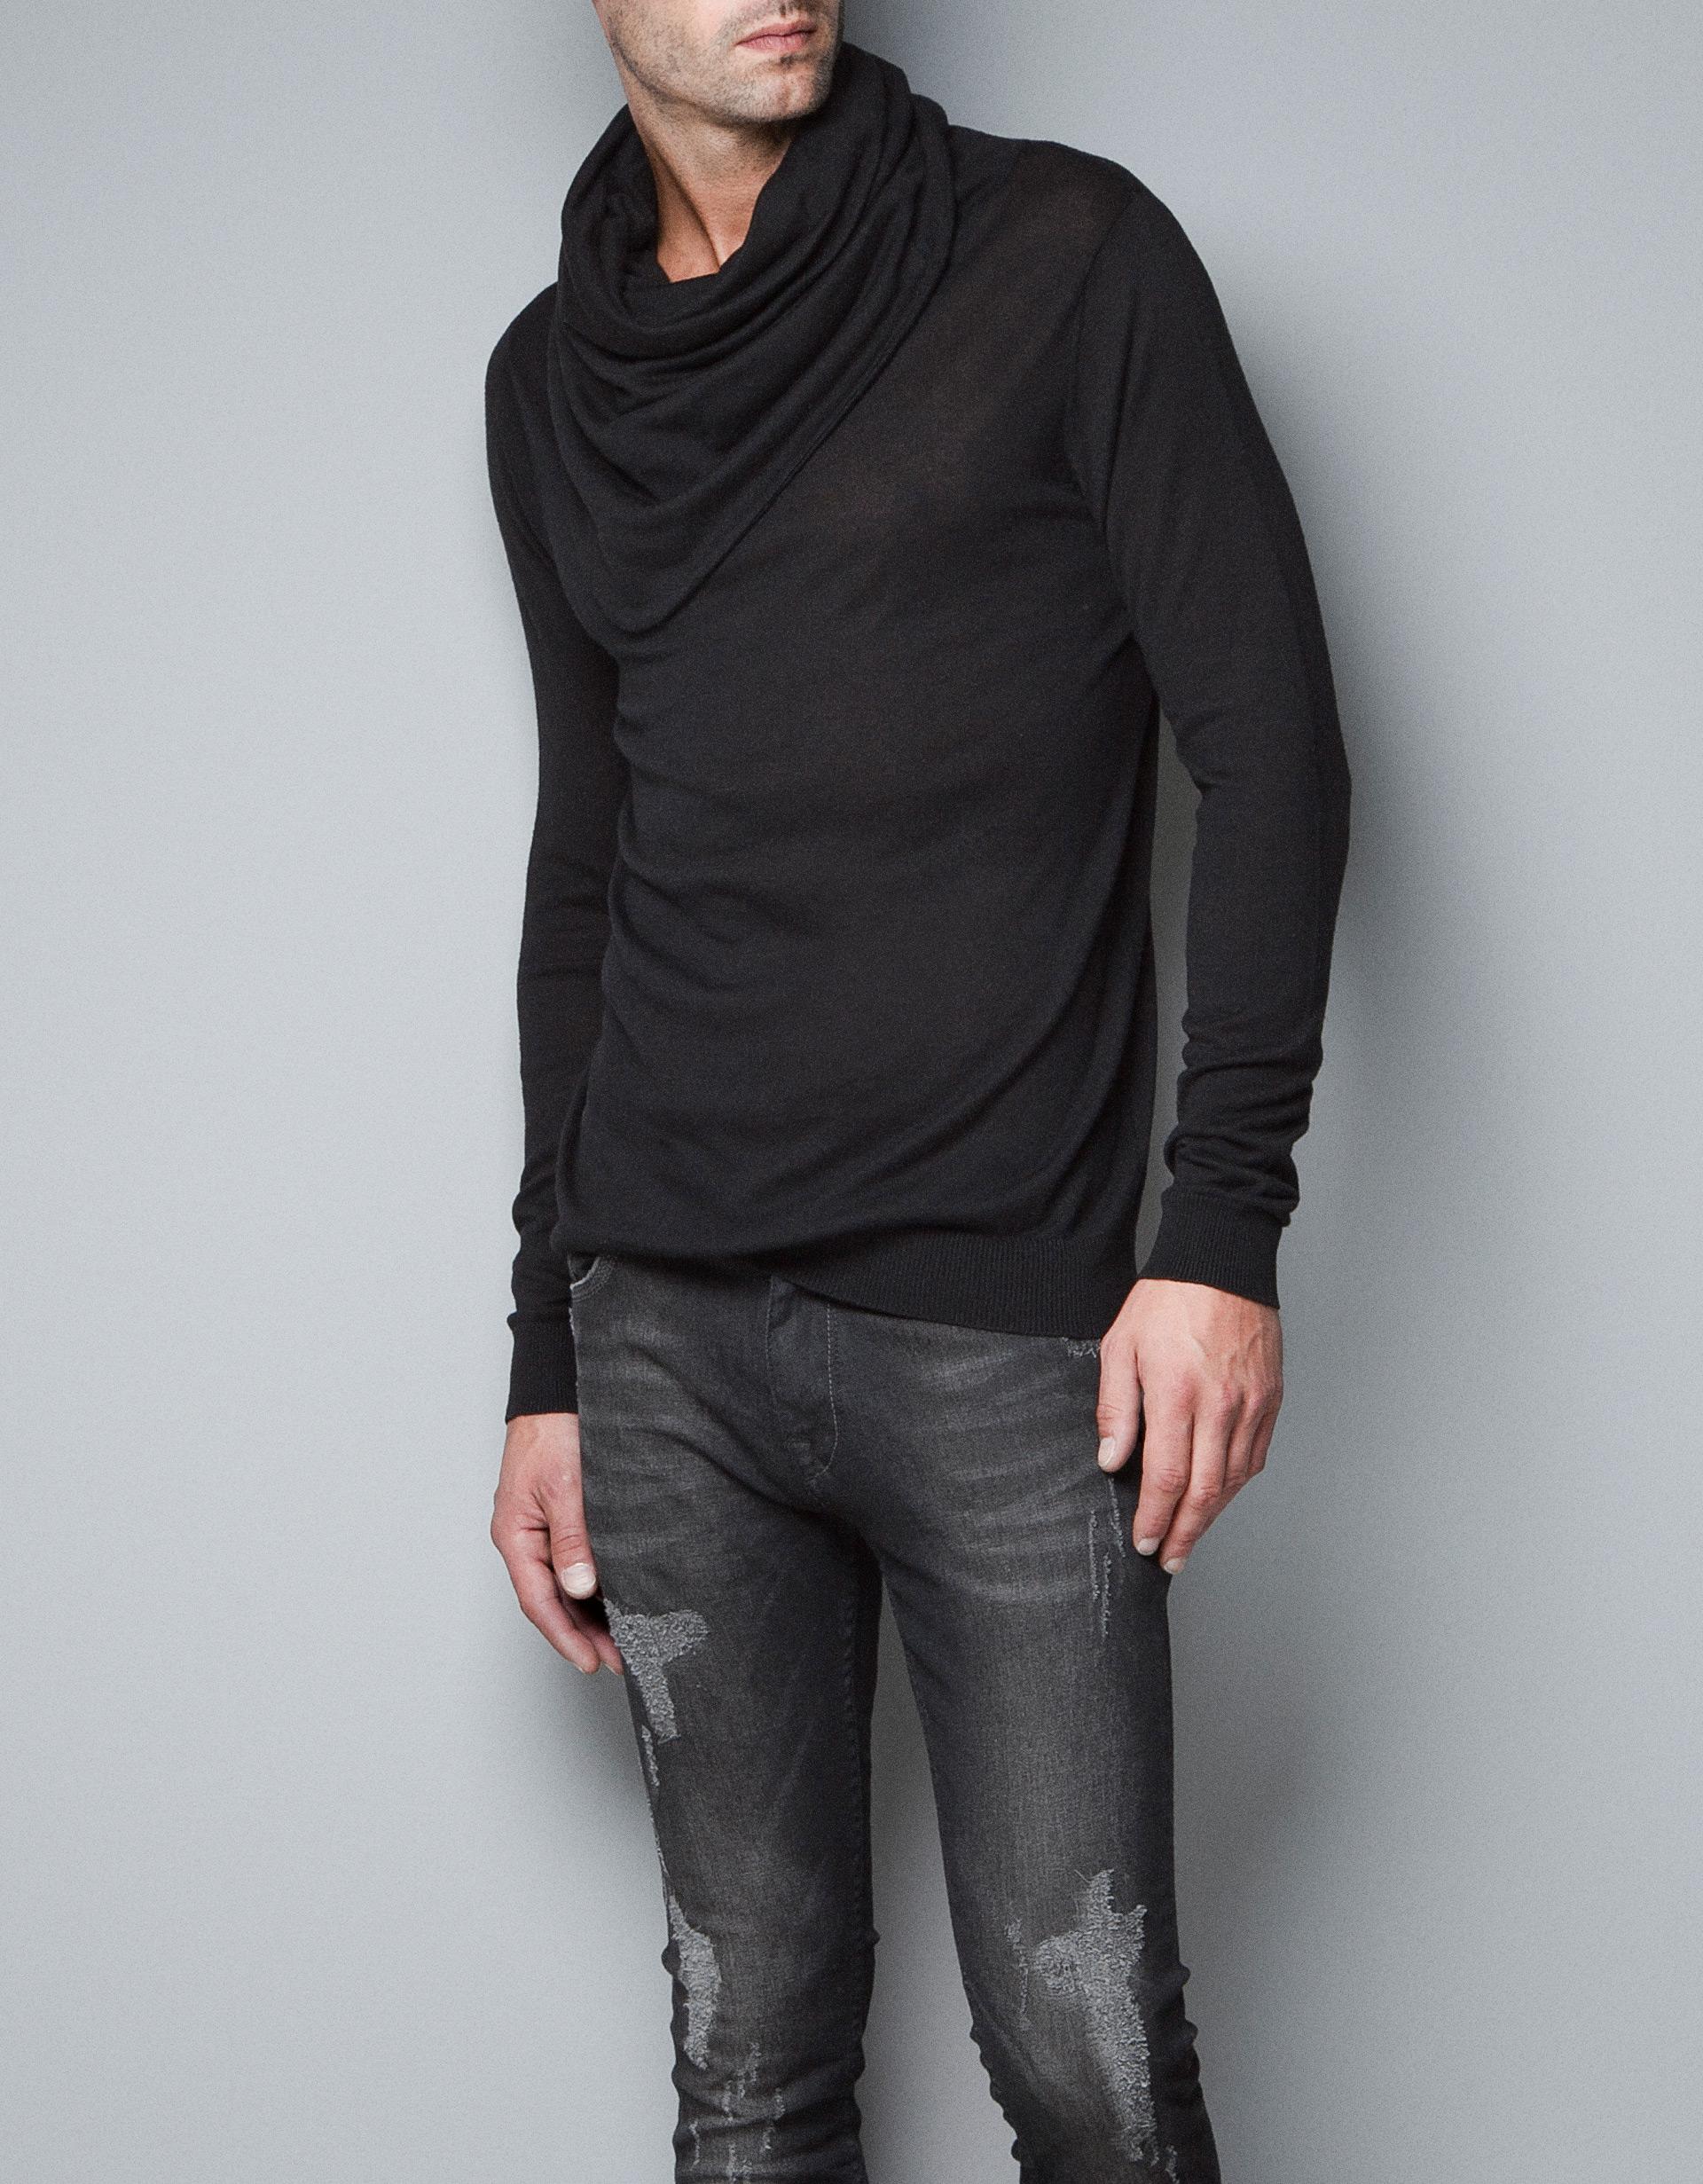 Zara Sweater Mens